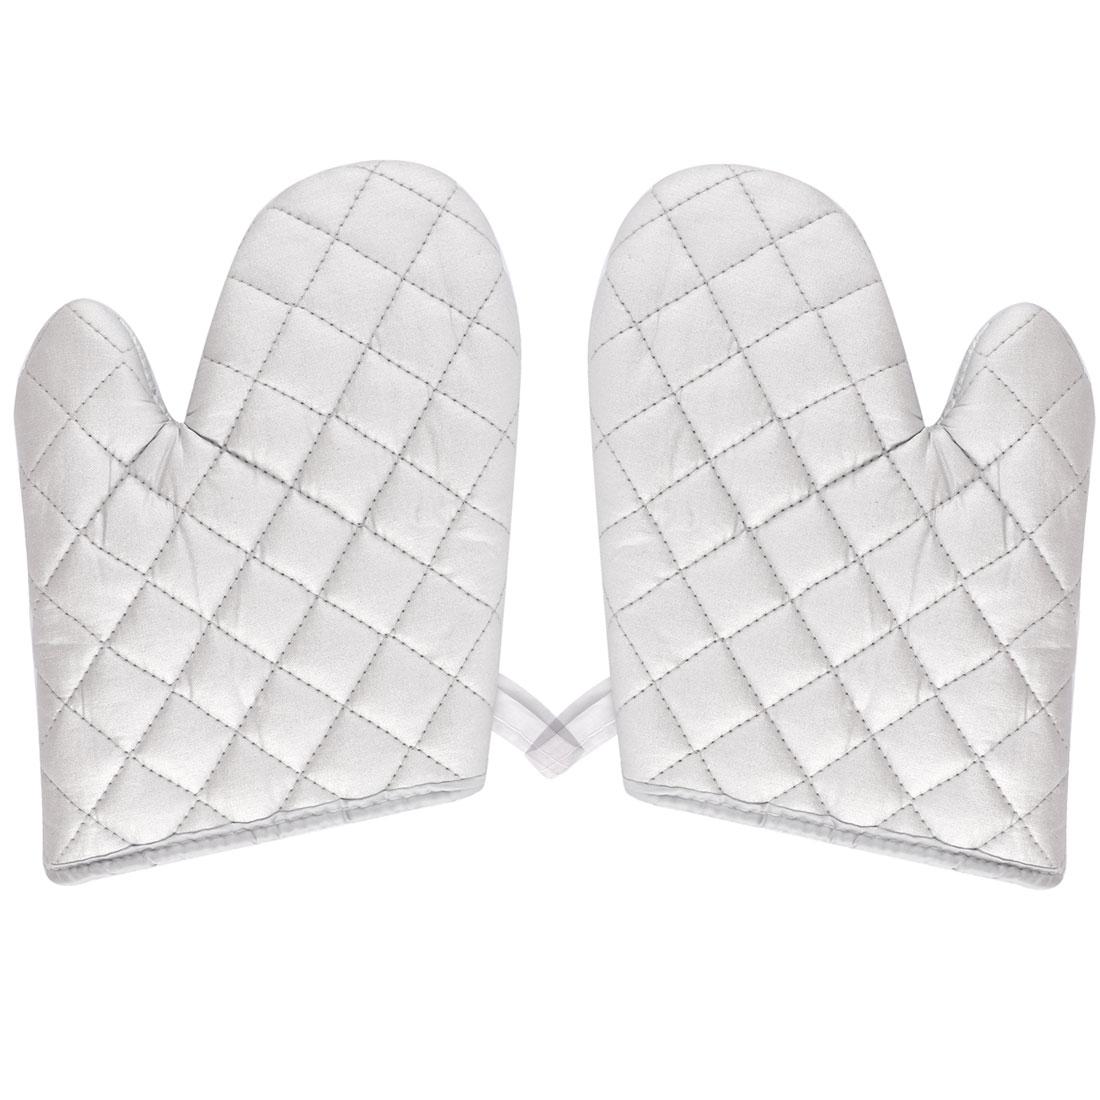 Kitchen Bakery Heat Resistance Microwave Baking Oven Mitt Gloves Silver White Pair